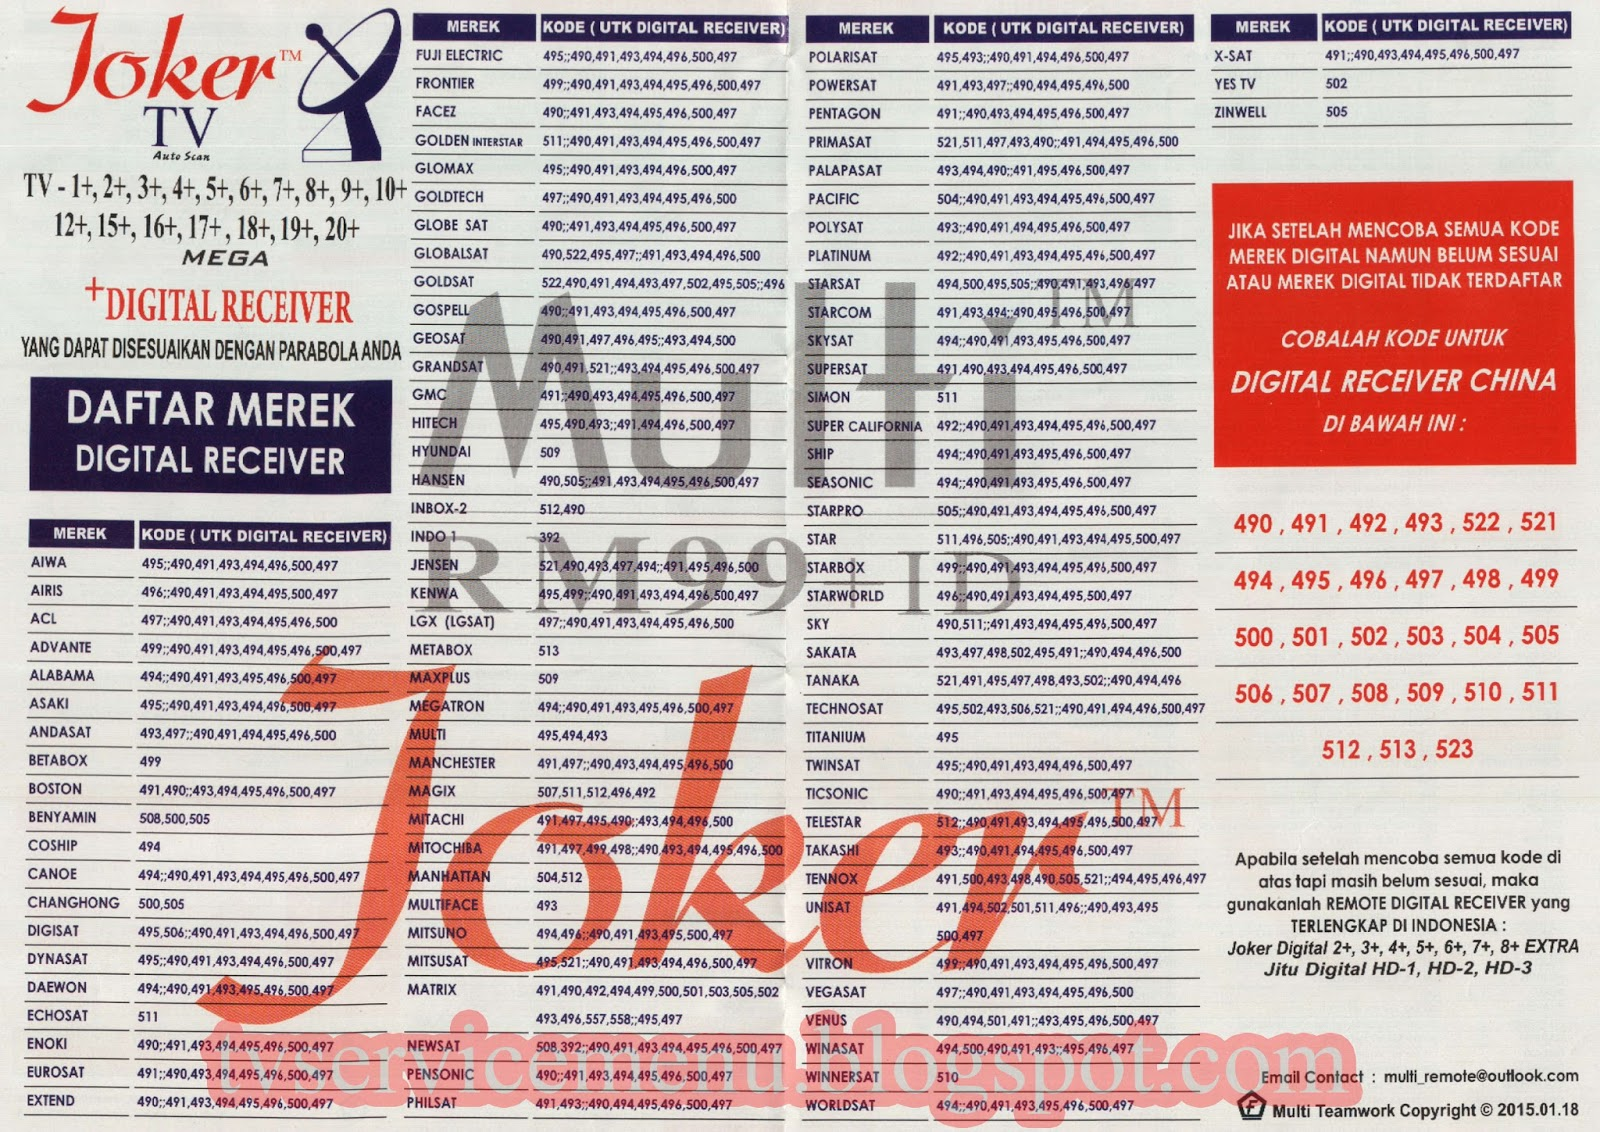 Daftar kode receiver remote joker